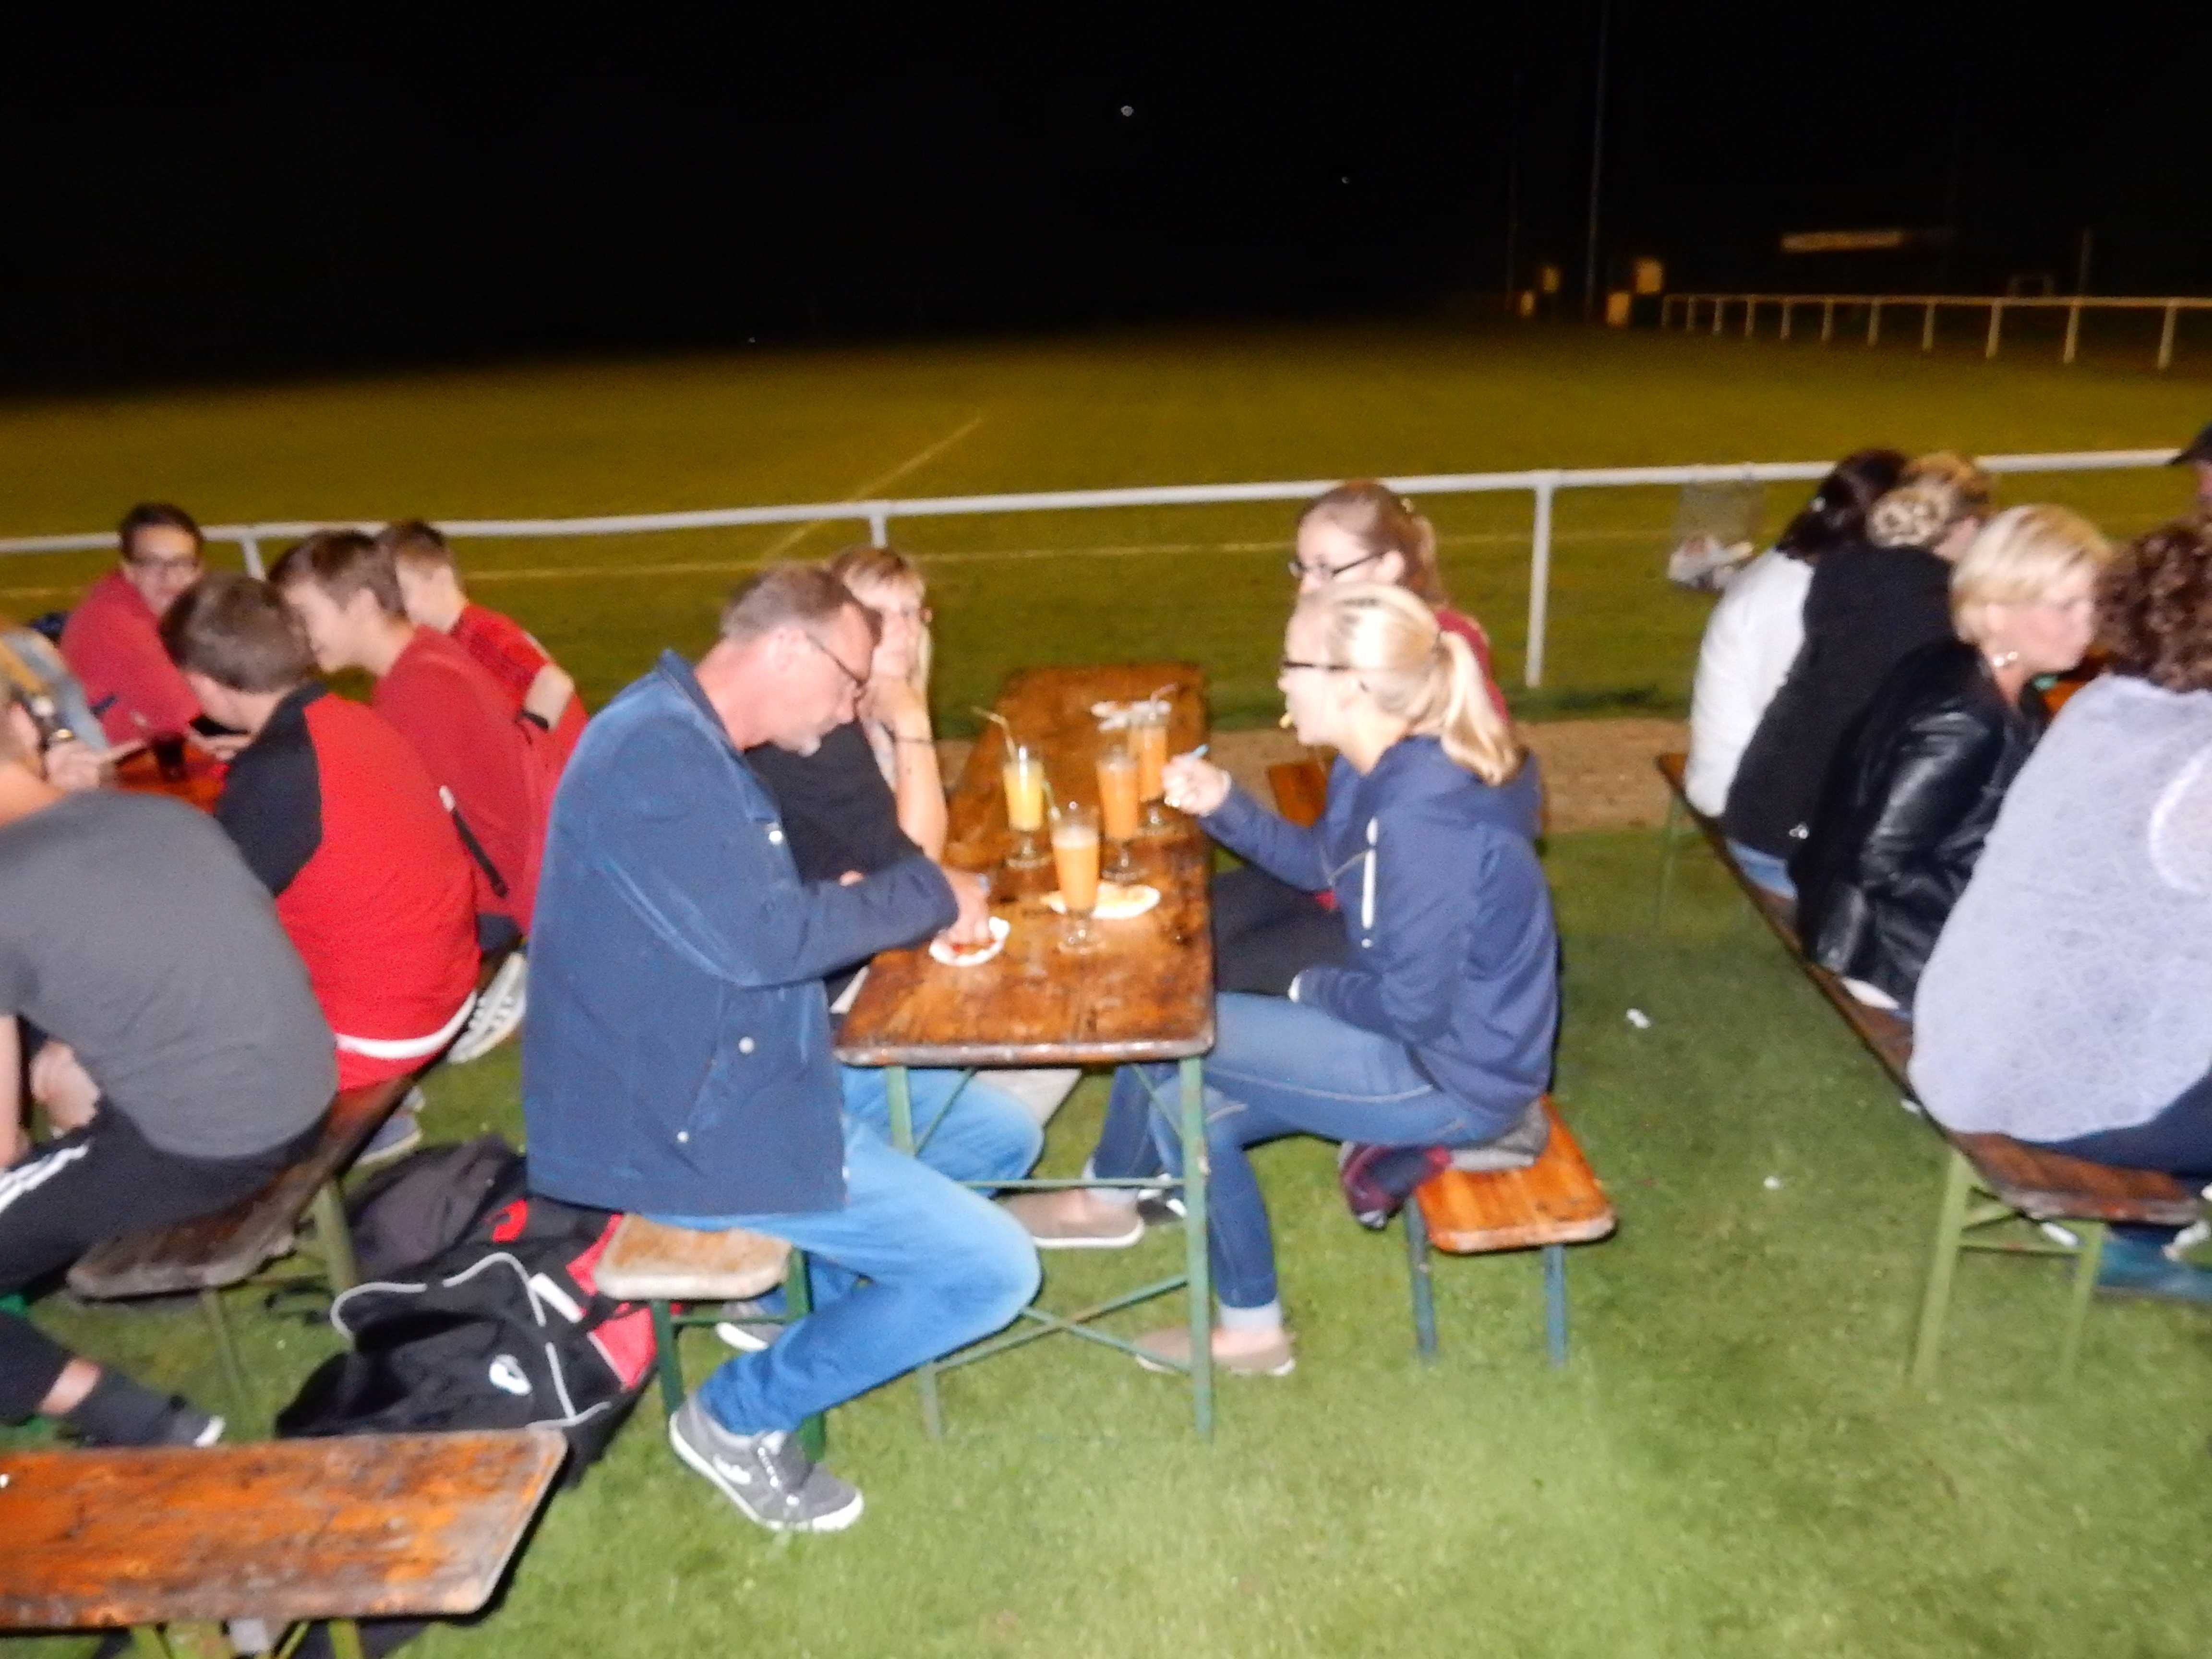 2016-07-28 Sportwoche - erster Donnerstag (77)